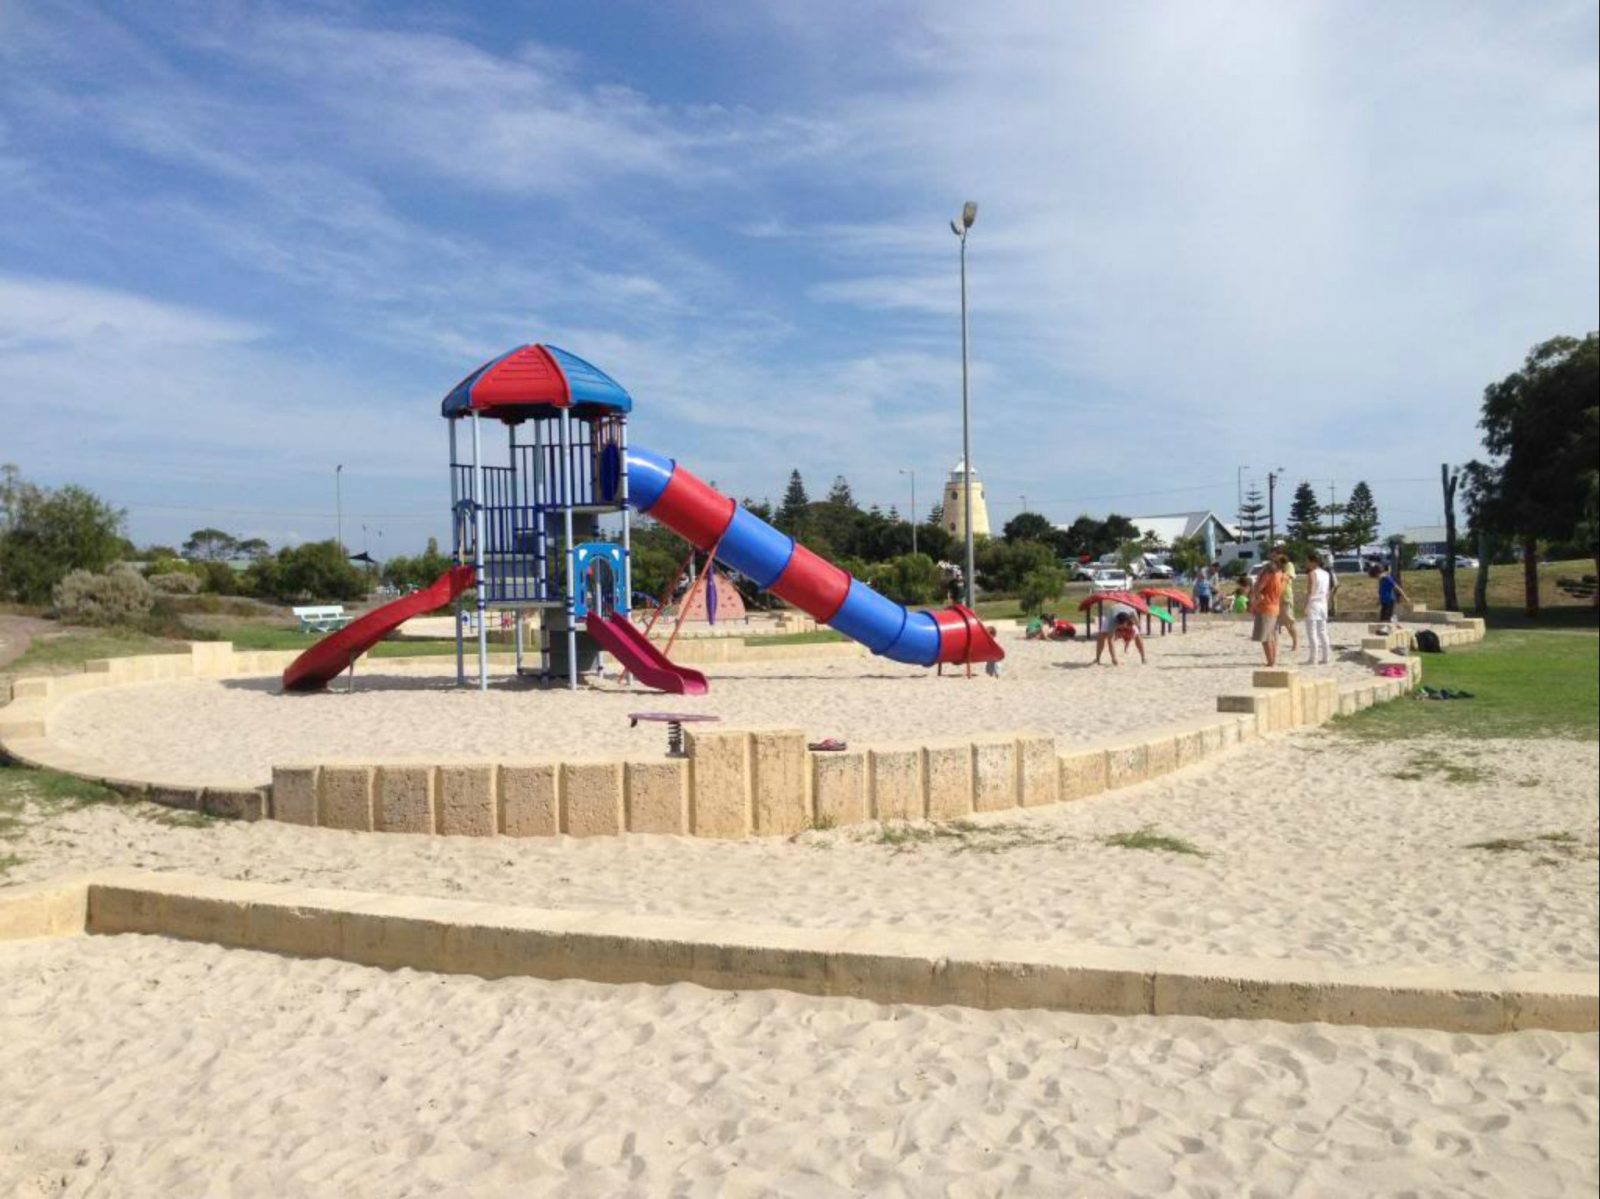 Yoganup Playground, Busselton, Western Australia